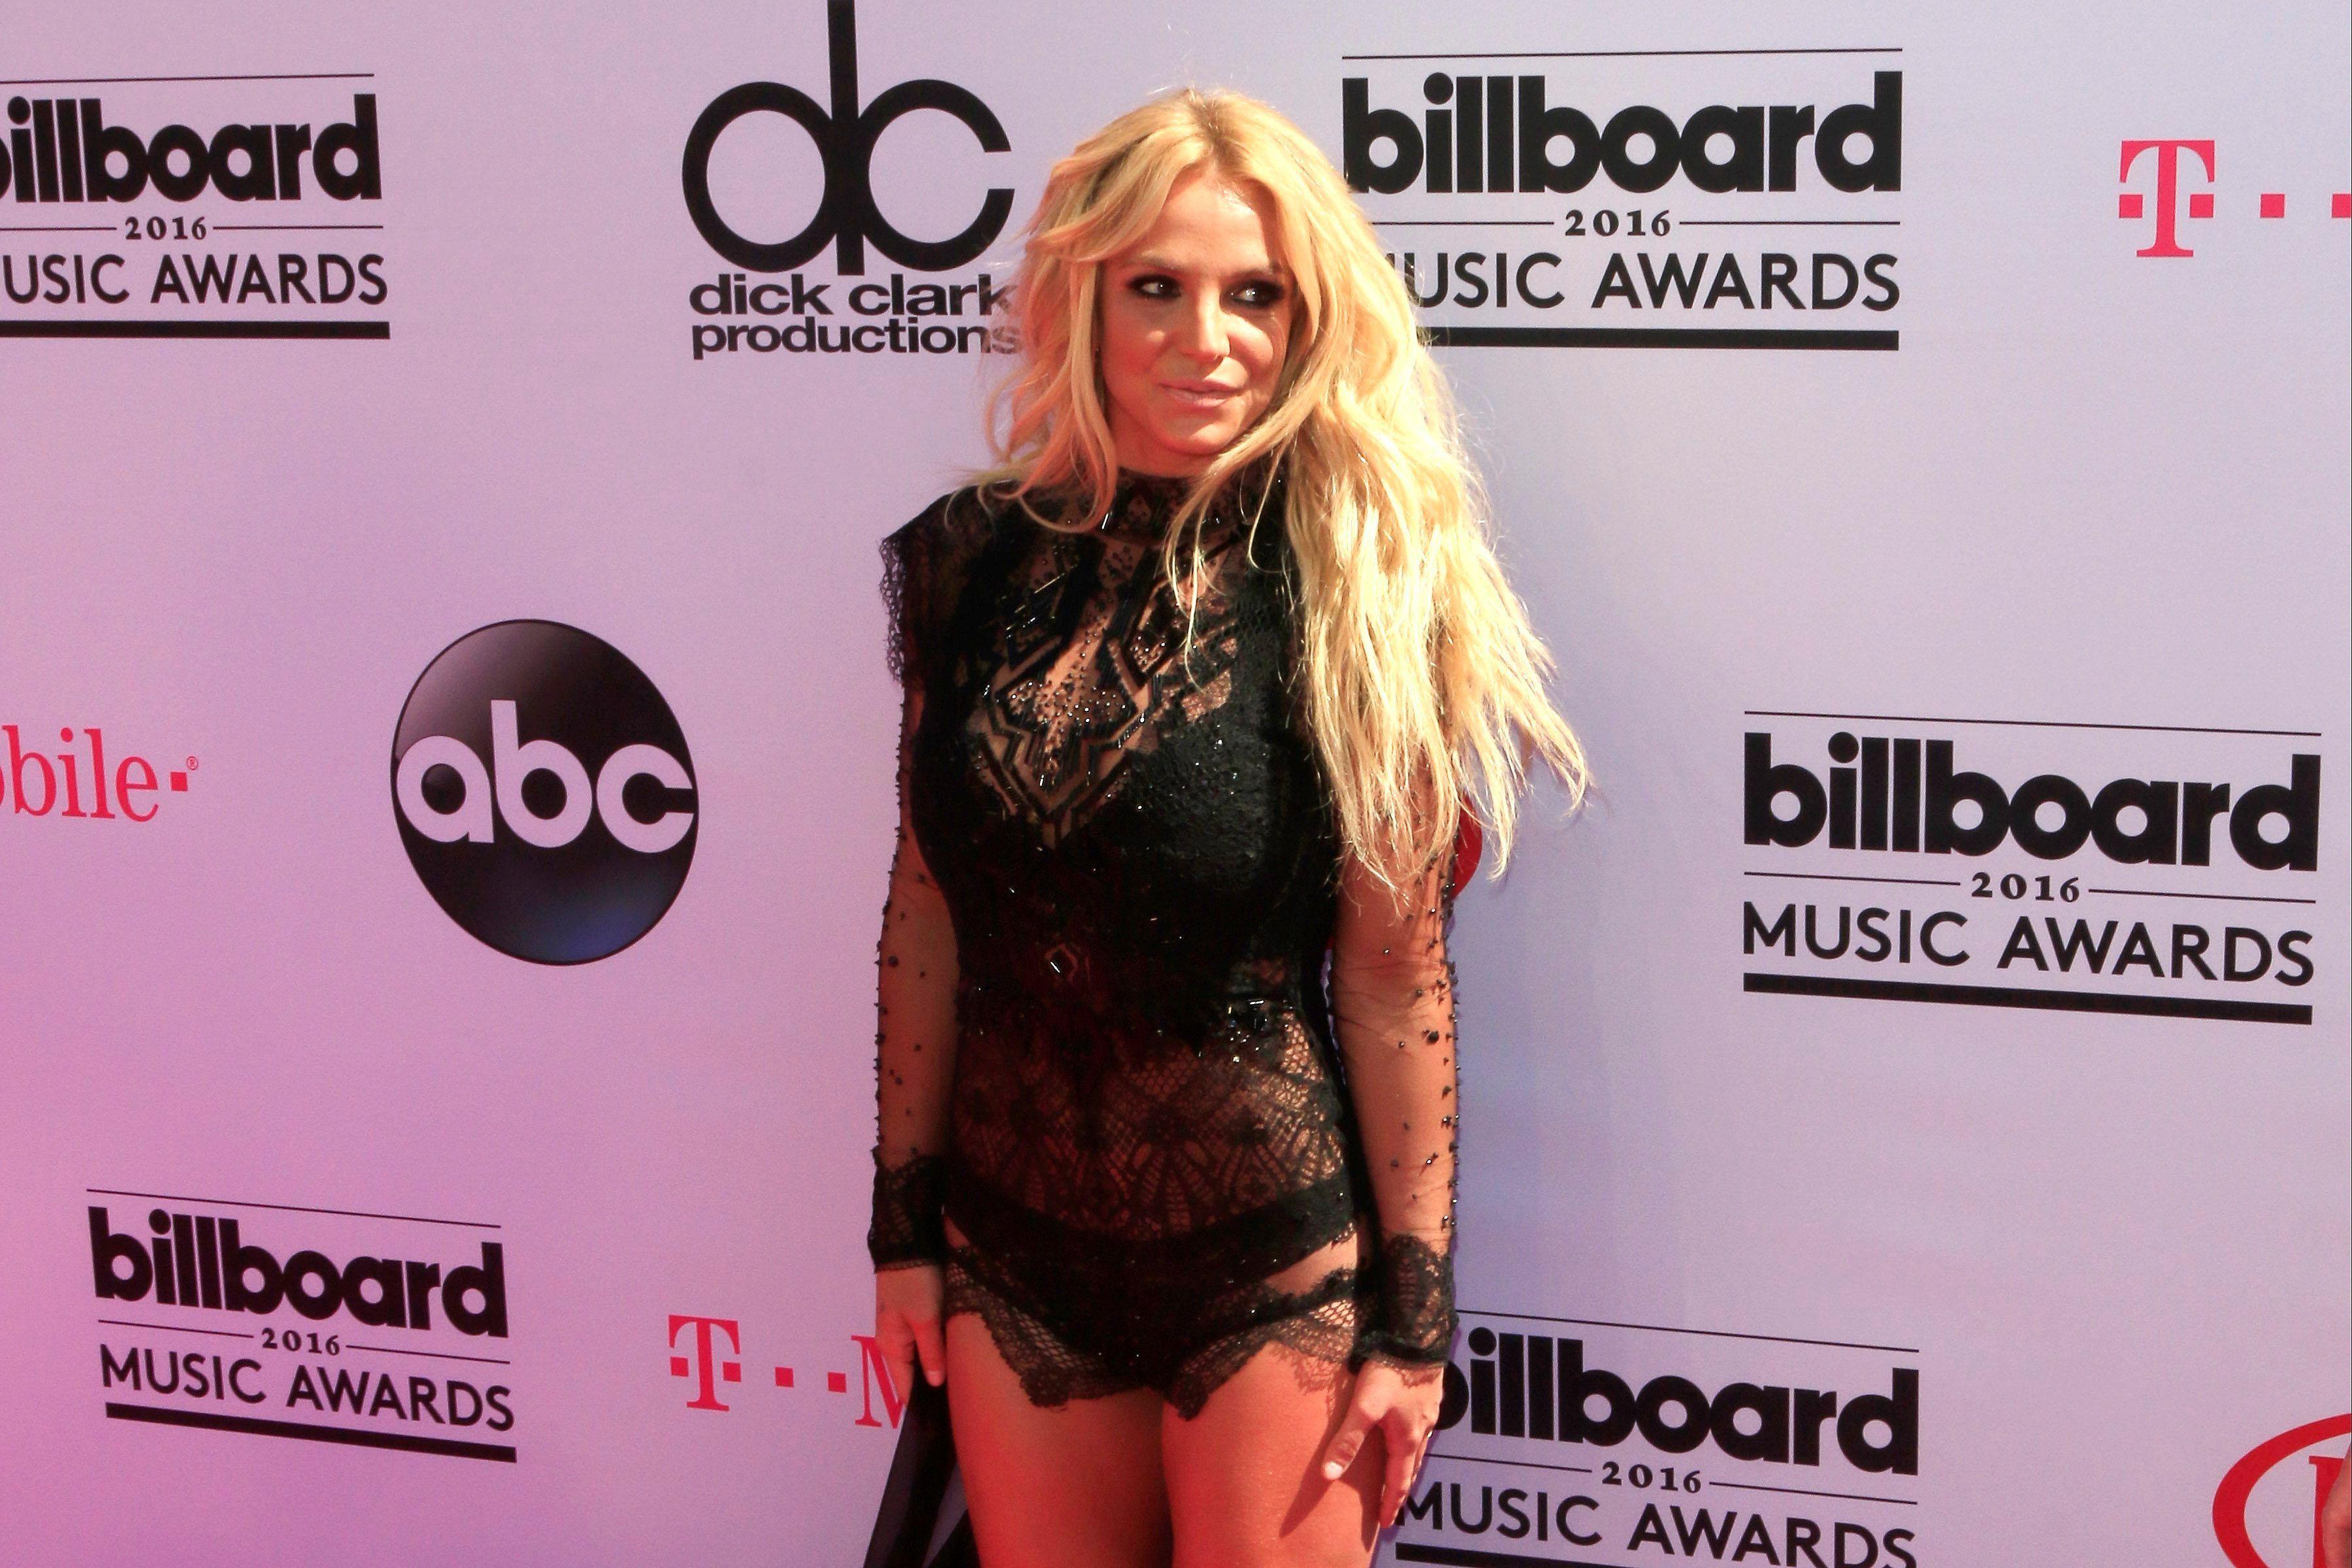 La cantante Britney Spears. EFE/NINA PROMMER/Archivo